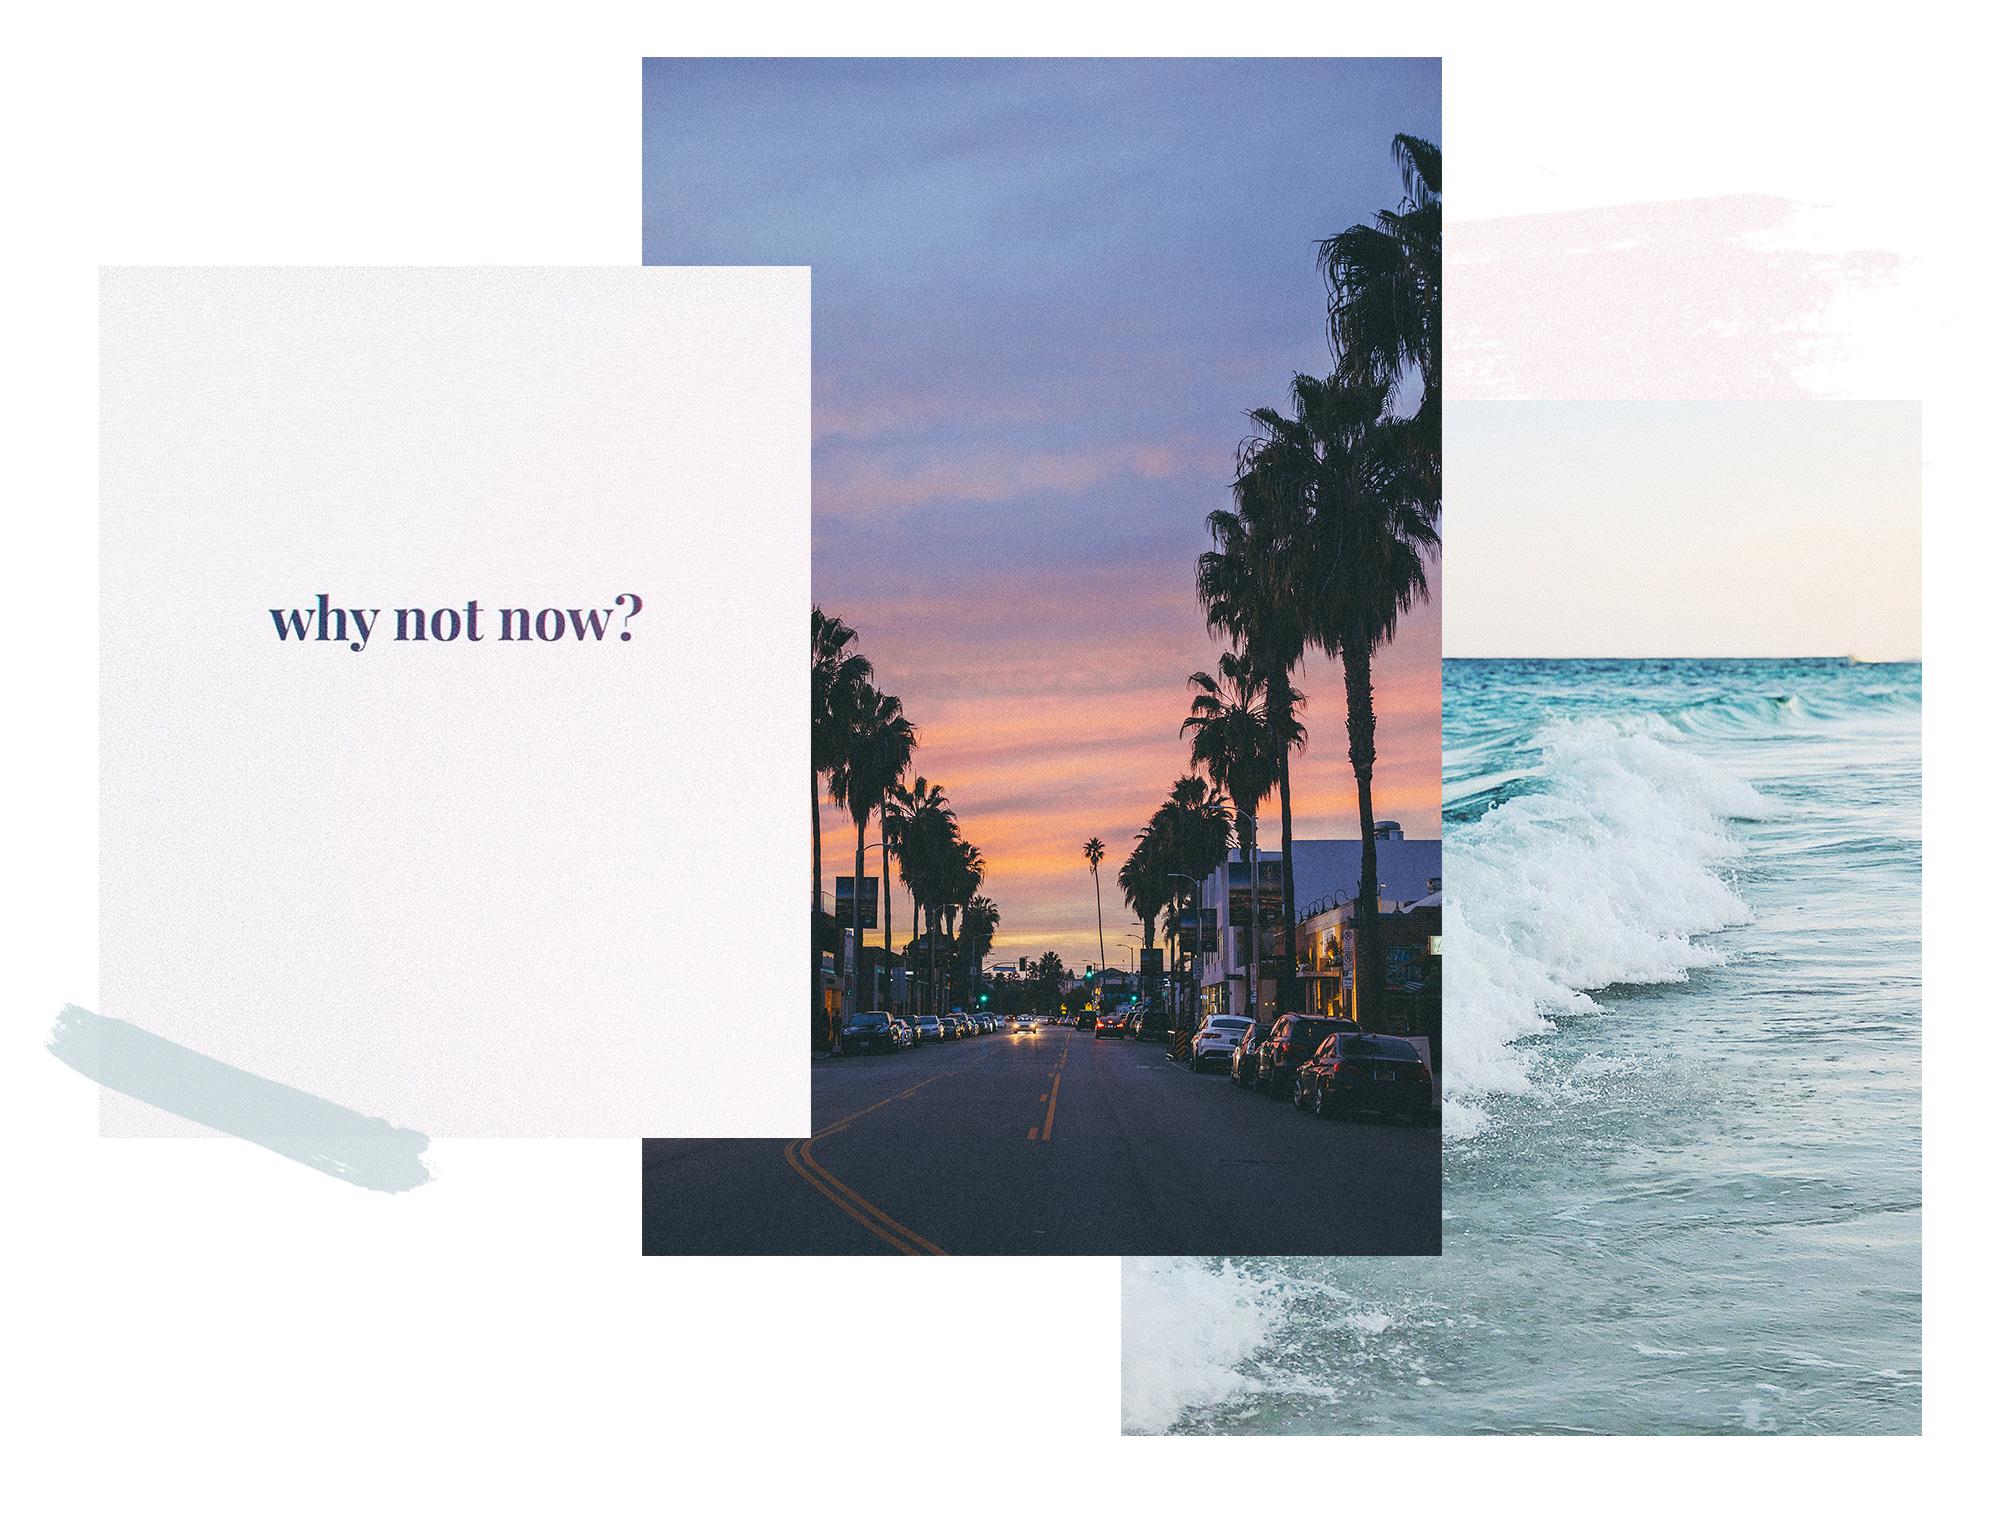 kelly-wirht-portfolio-collage.jpg